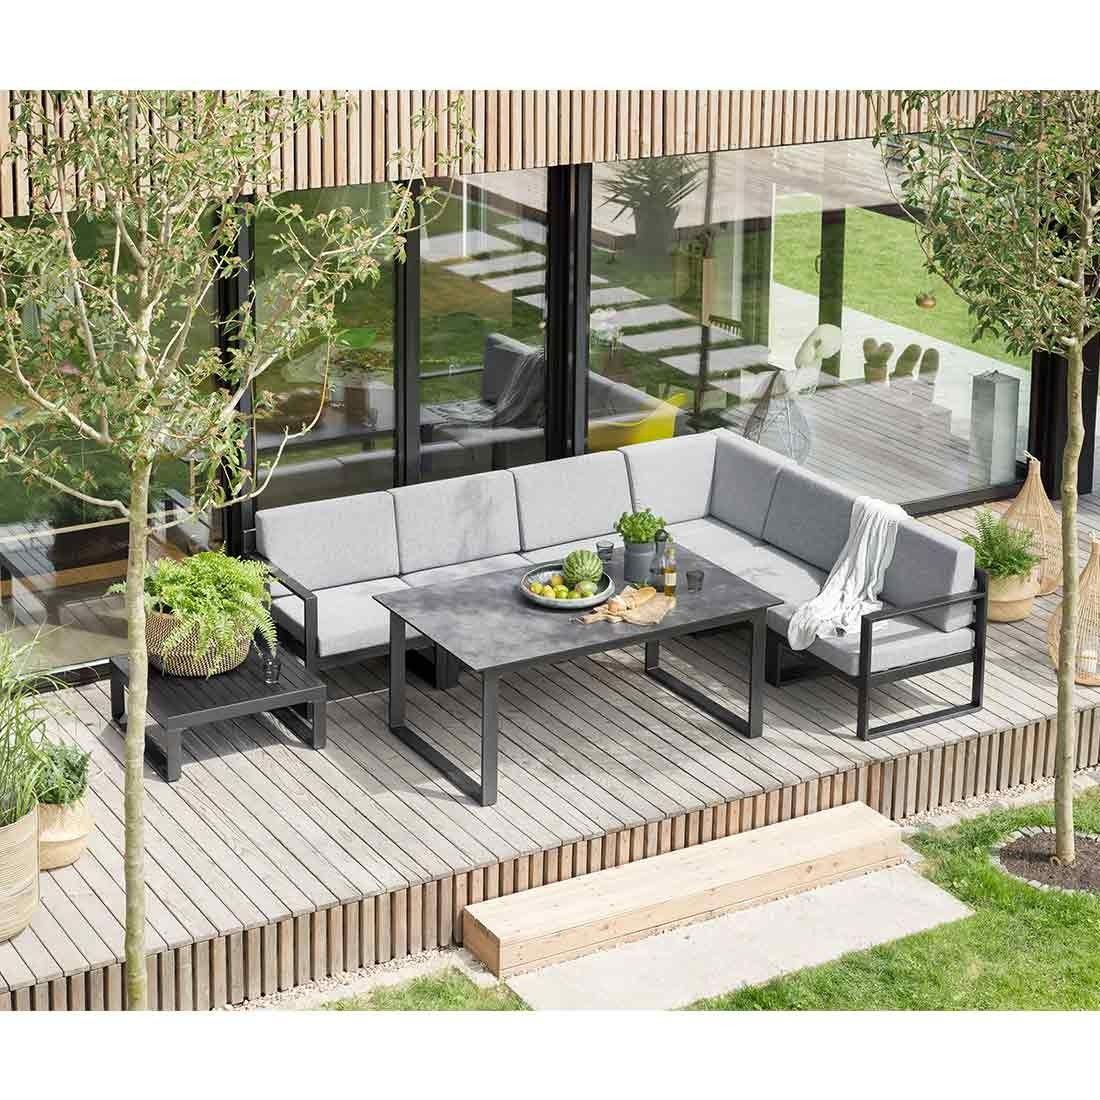 Full Size of Kettler Ocean Modular Diningecke 8 Teilig Aluminium Olefin In 2020 Fenster Garten Loungemöbel Holz Verbundplatte Küche Günstig Wohnzimmer Loungemöbel Aluminium